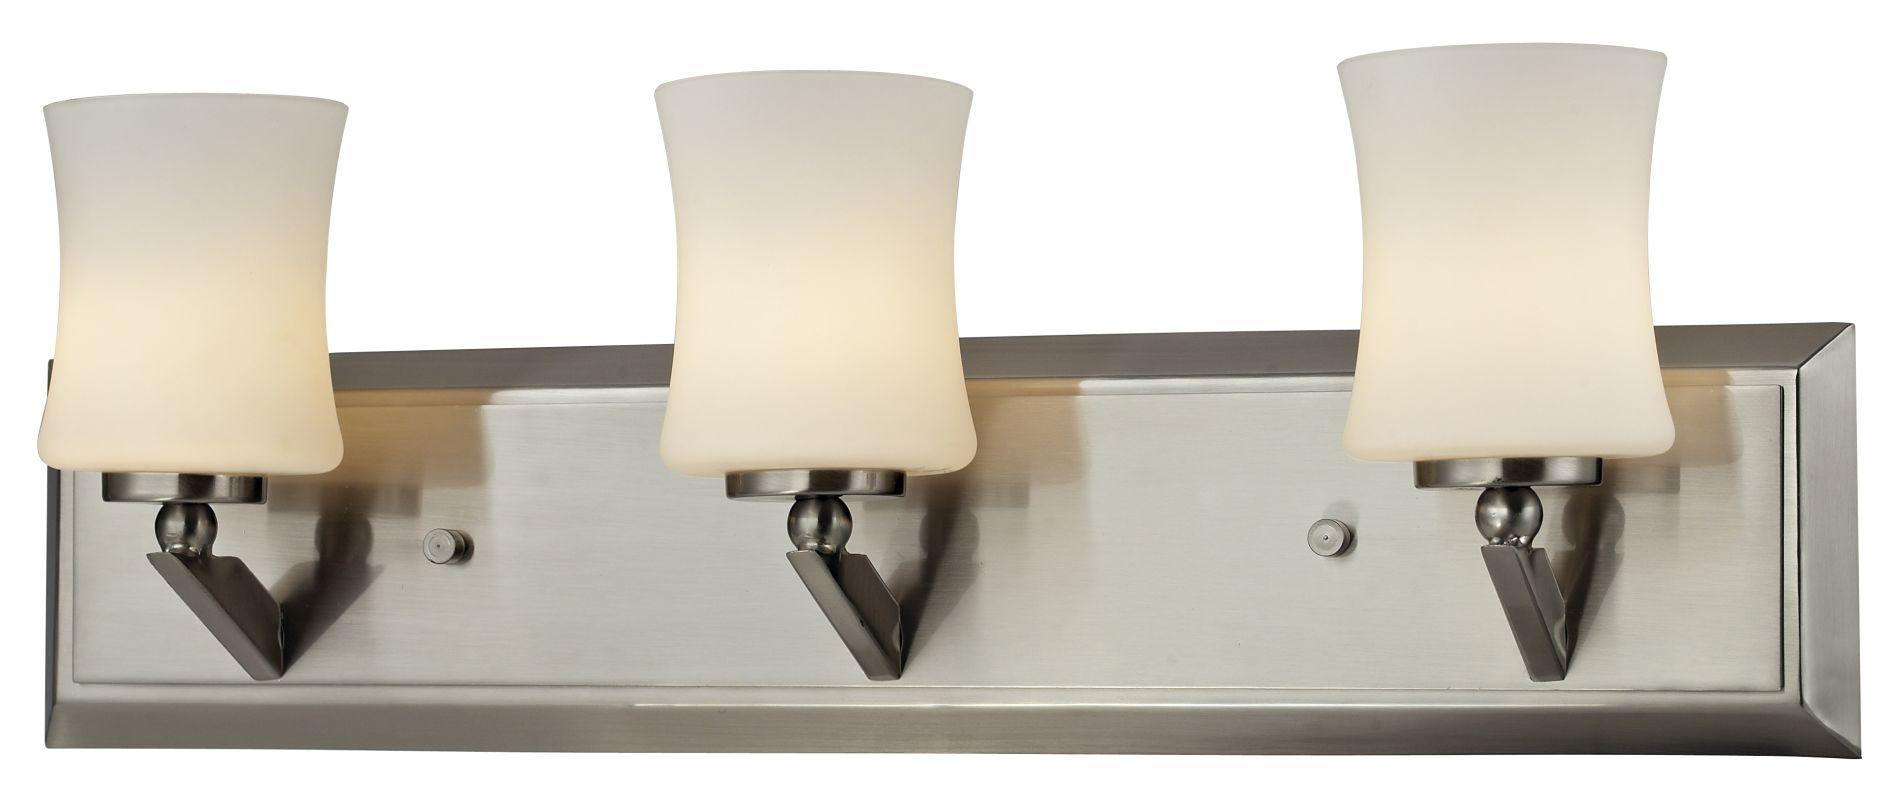 Z-Lite 609-3V Elite 3 Light Bathroom Vanity Light with Matte Opal